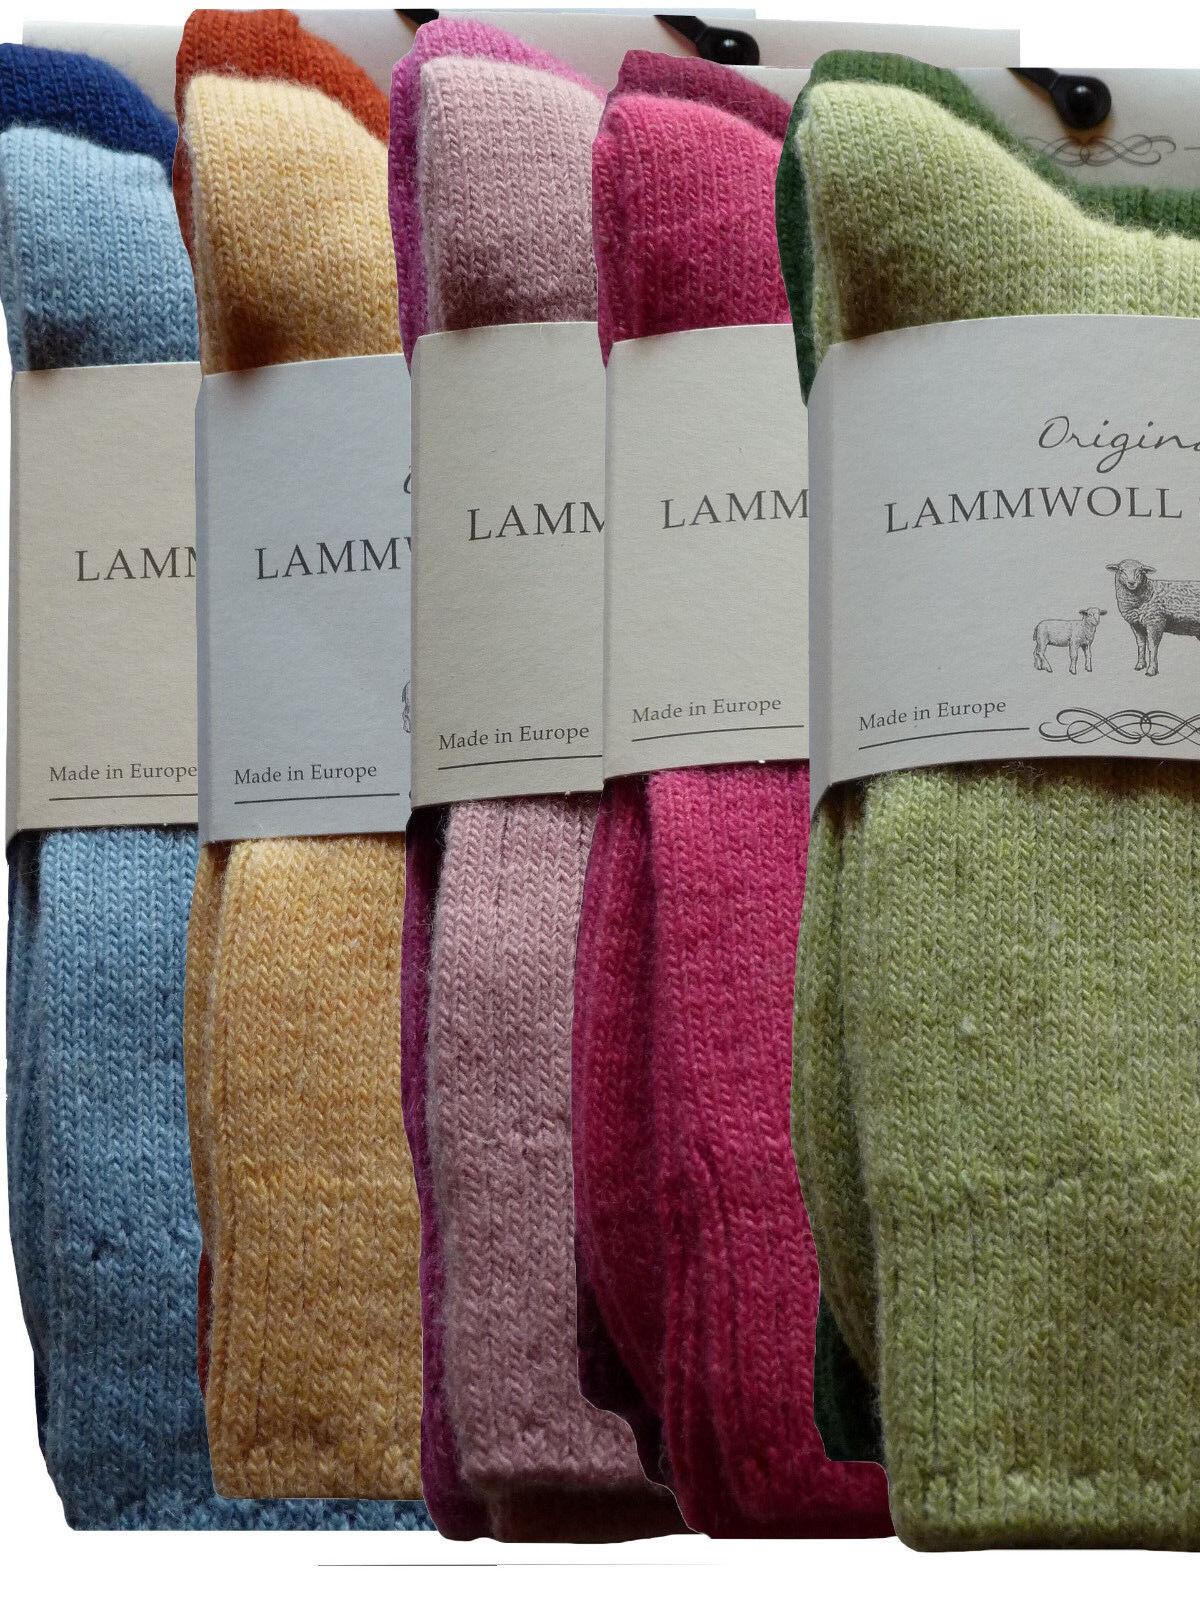 2 Paar Damen LAMMWOLL SOCKEN Wollsocken Schurwolle farbig extra warm Gr. 35-42